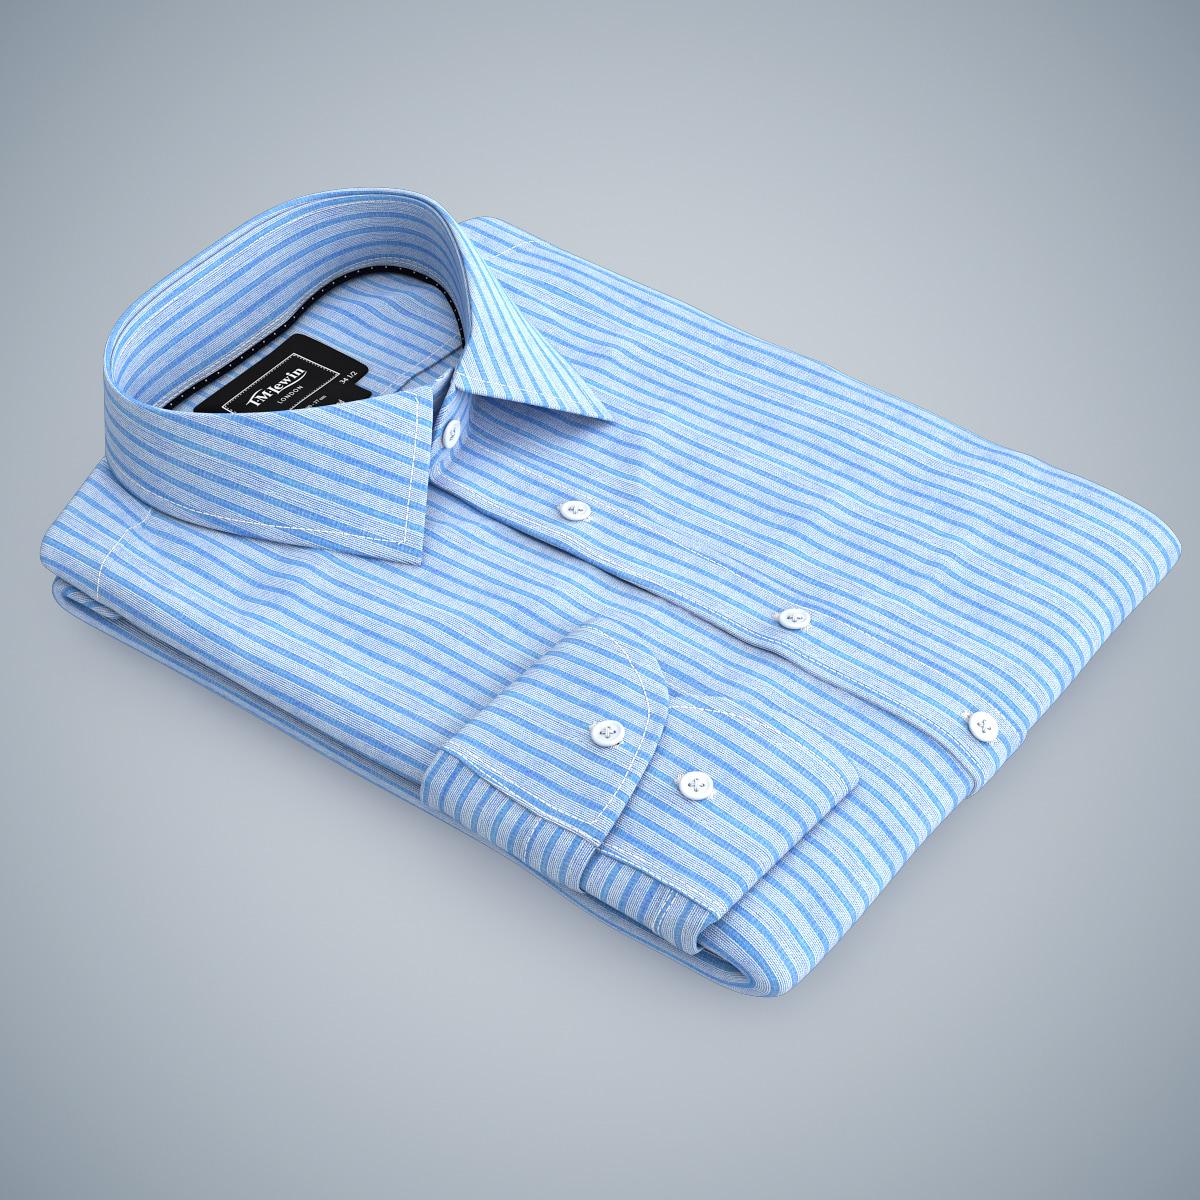 Shirts Ties 3_dark_00072.jpg